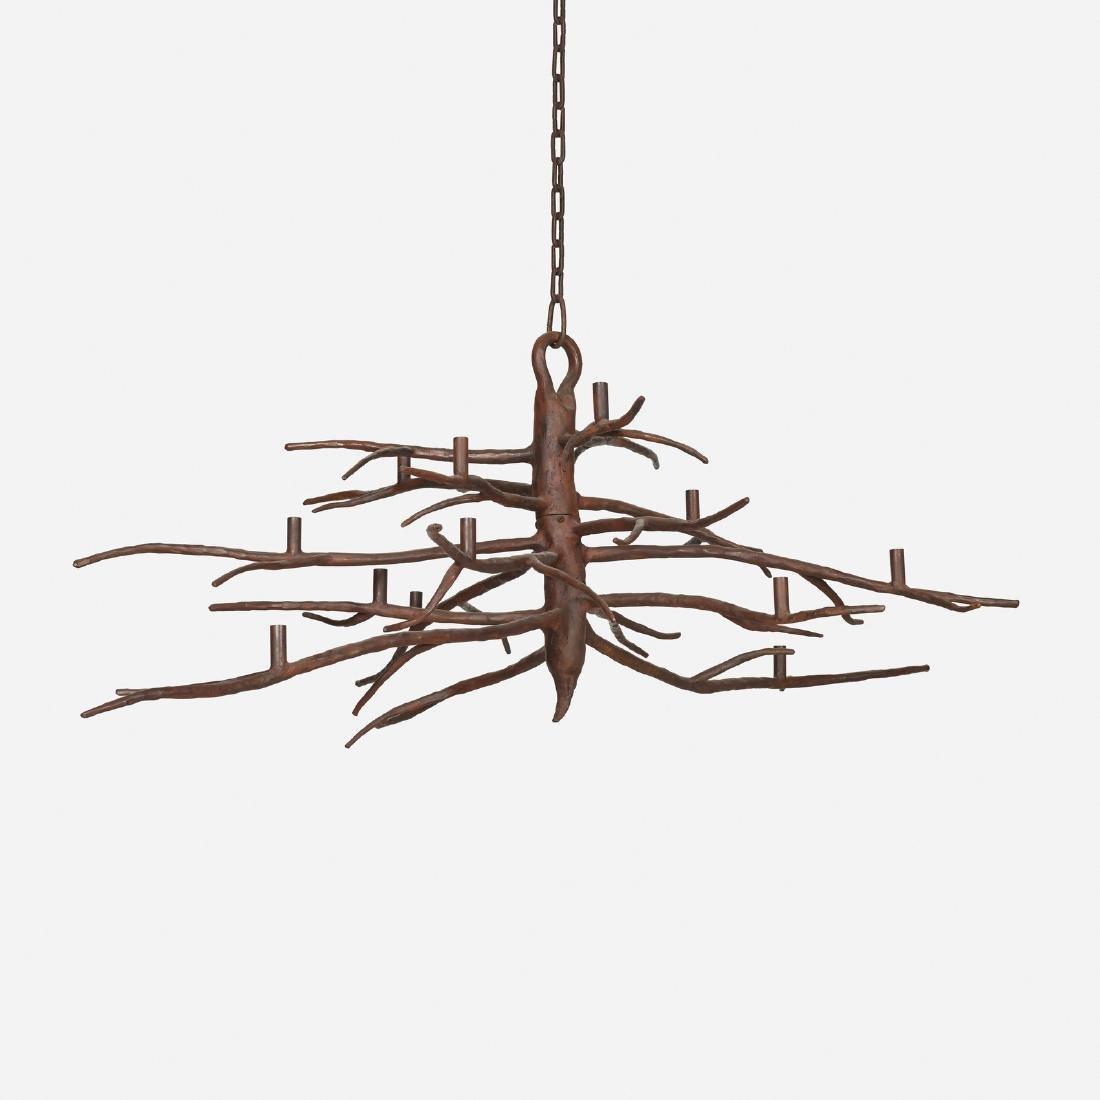 Michael Del Piero, Iron Branch chandelier